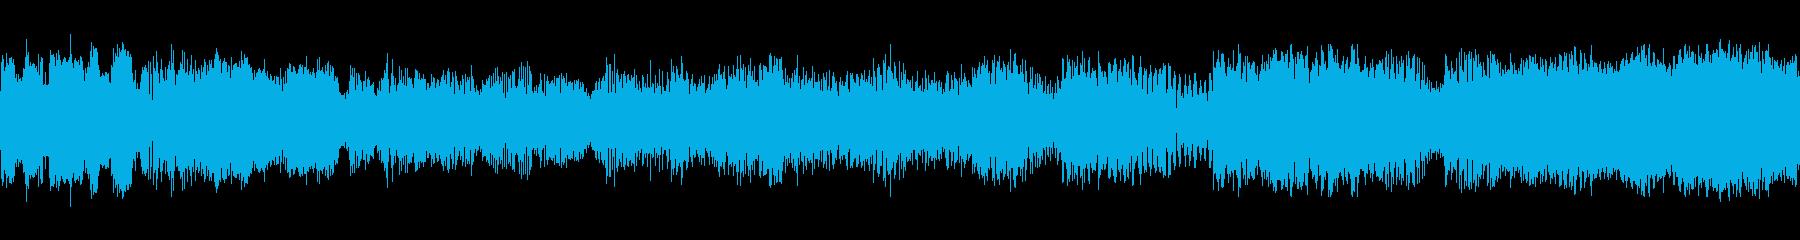 SLO MOトランジションの再生済みの波形